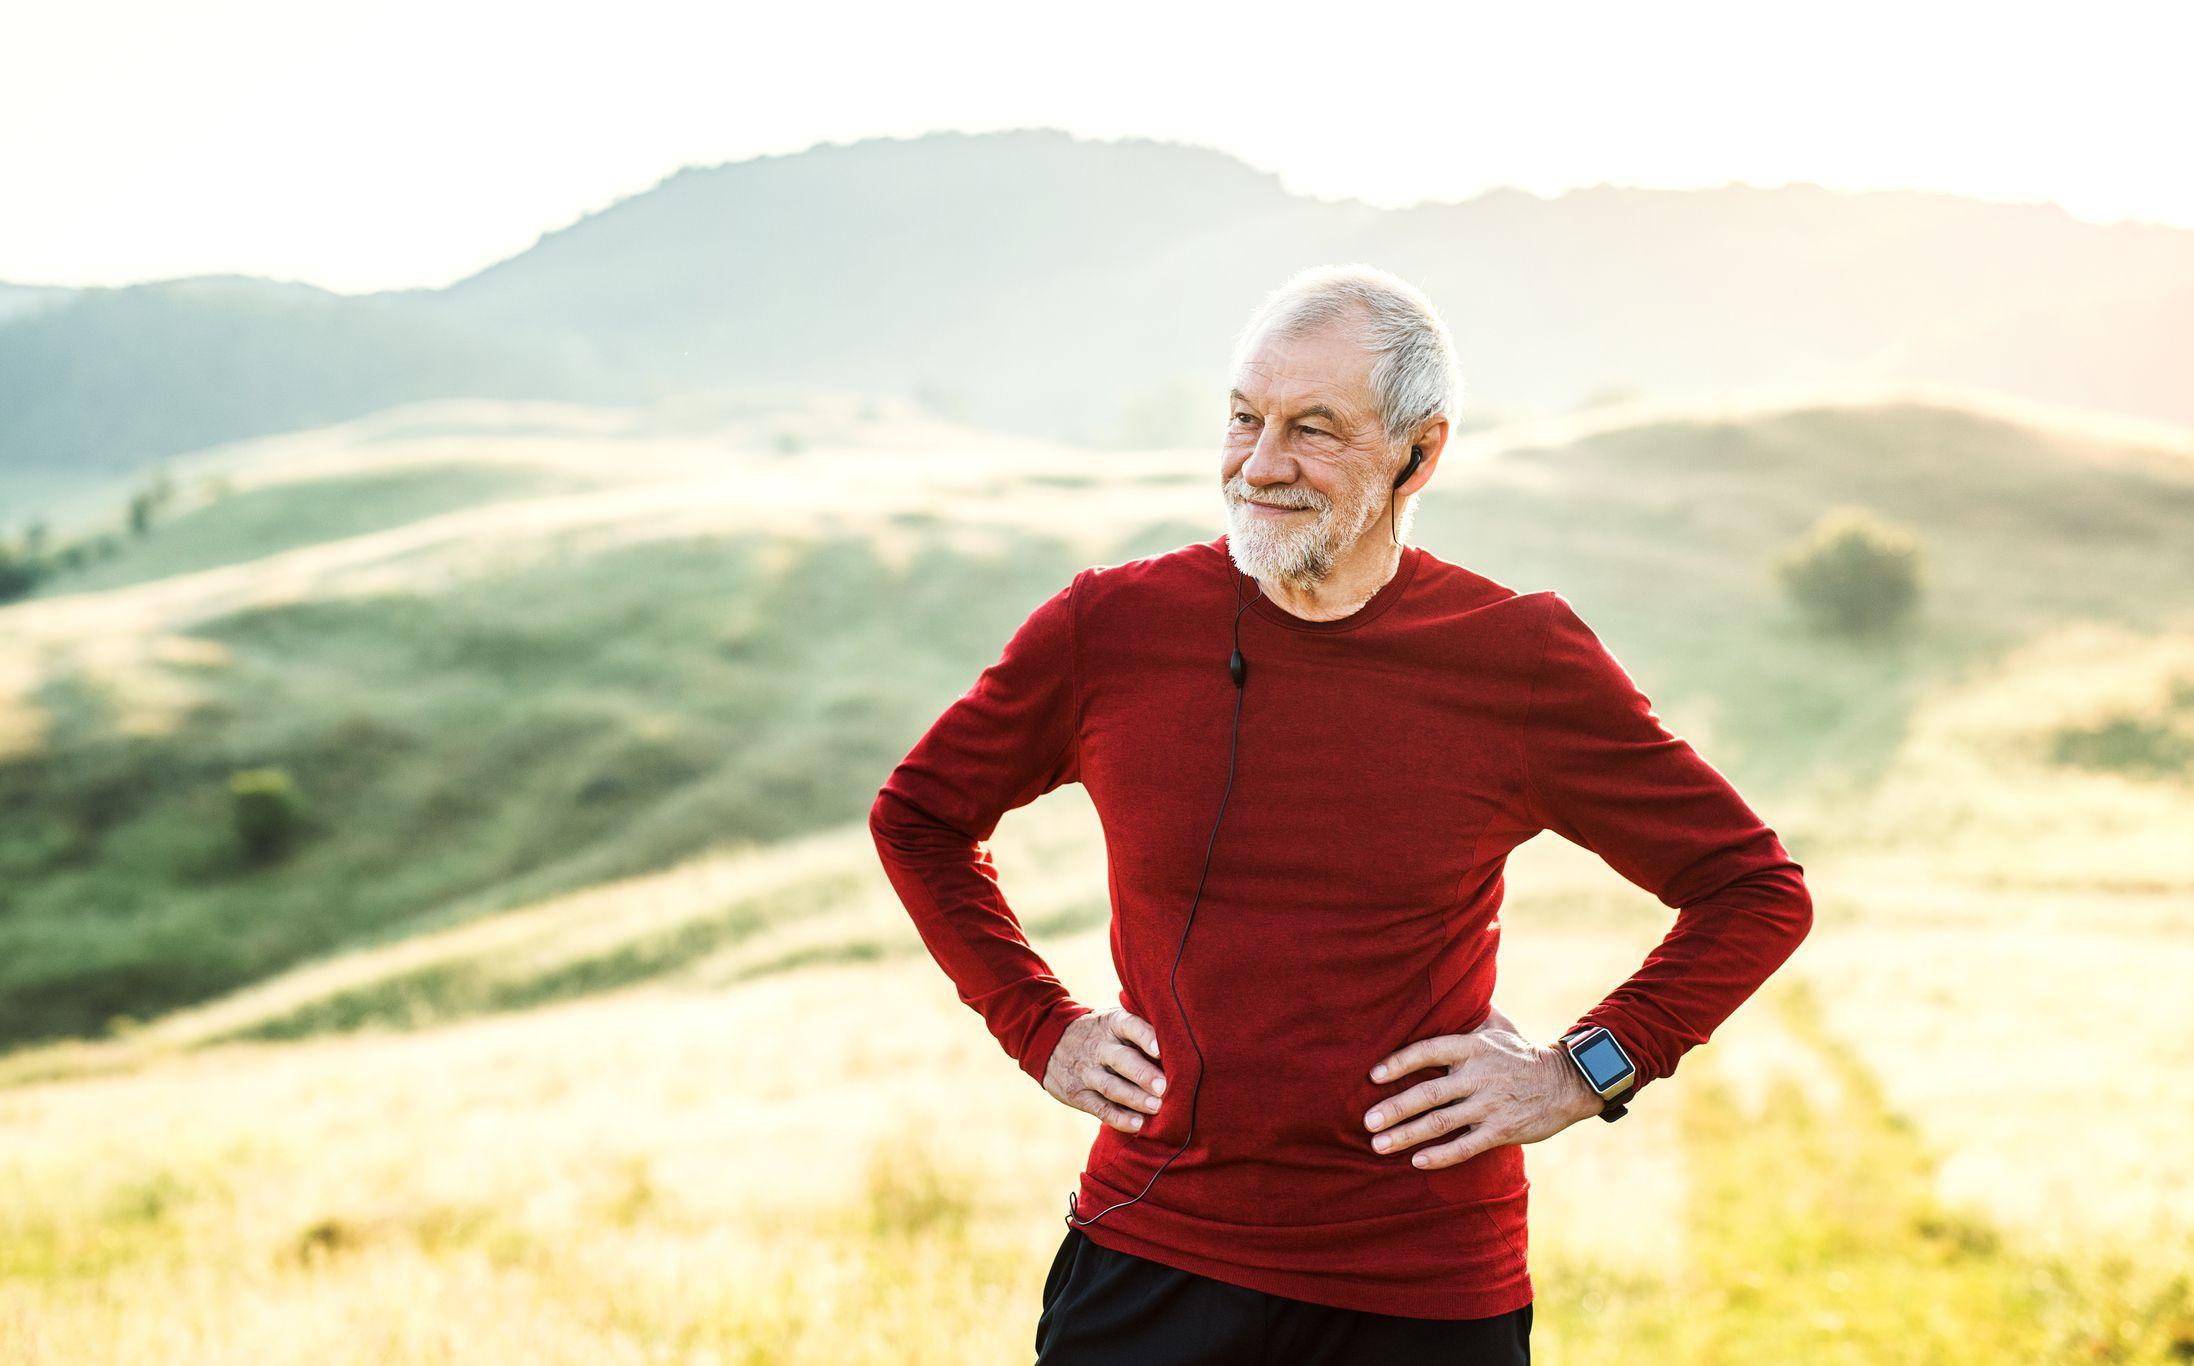 A 10-week run-walk plan for complete beginners